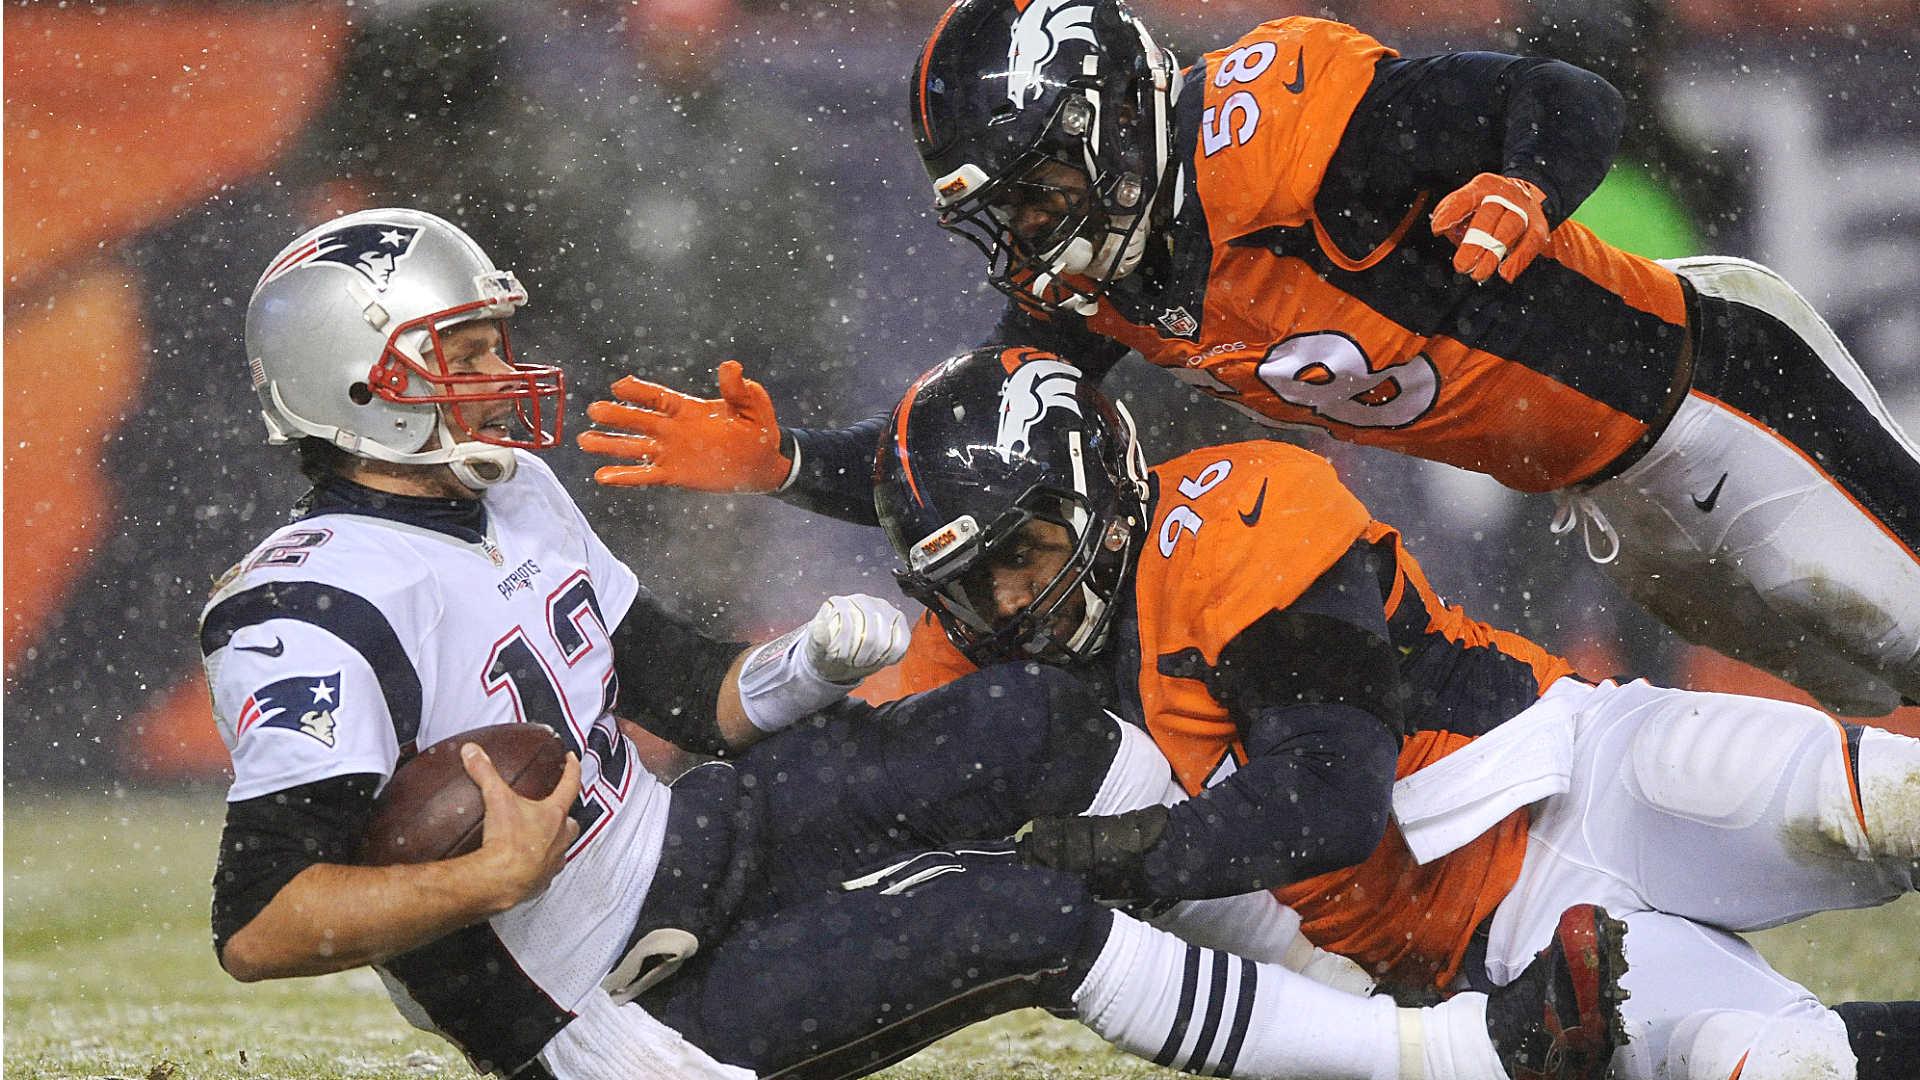 Brady-Broncos-012015-USNews-Getty-FTR